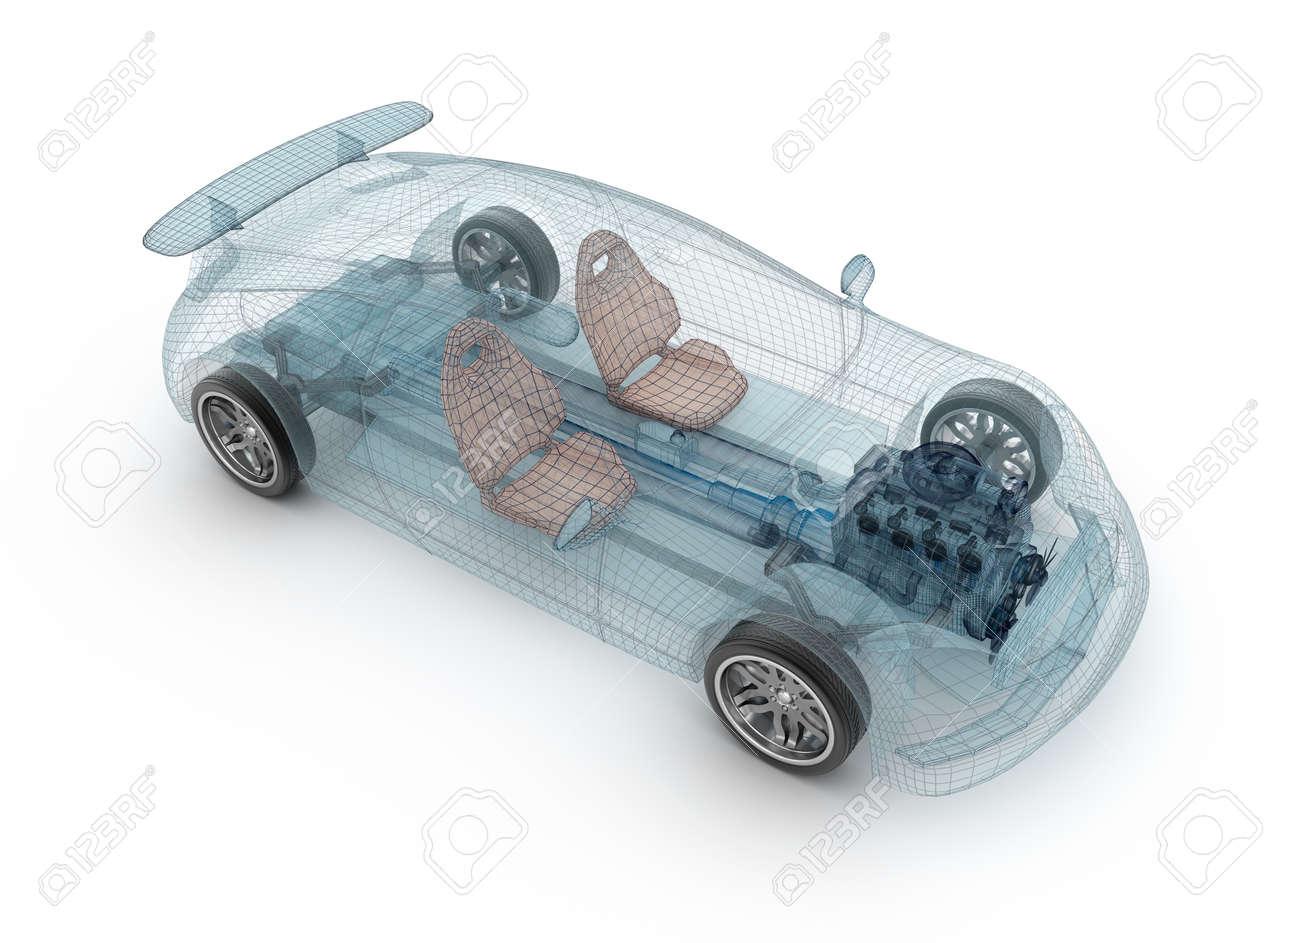 Design my car - Transparent Car Design Wire Model 3d Illustration My Own Car Design Stock